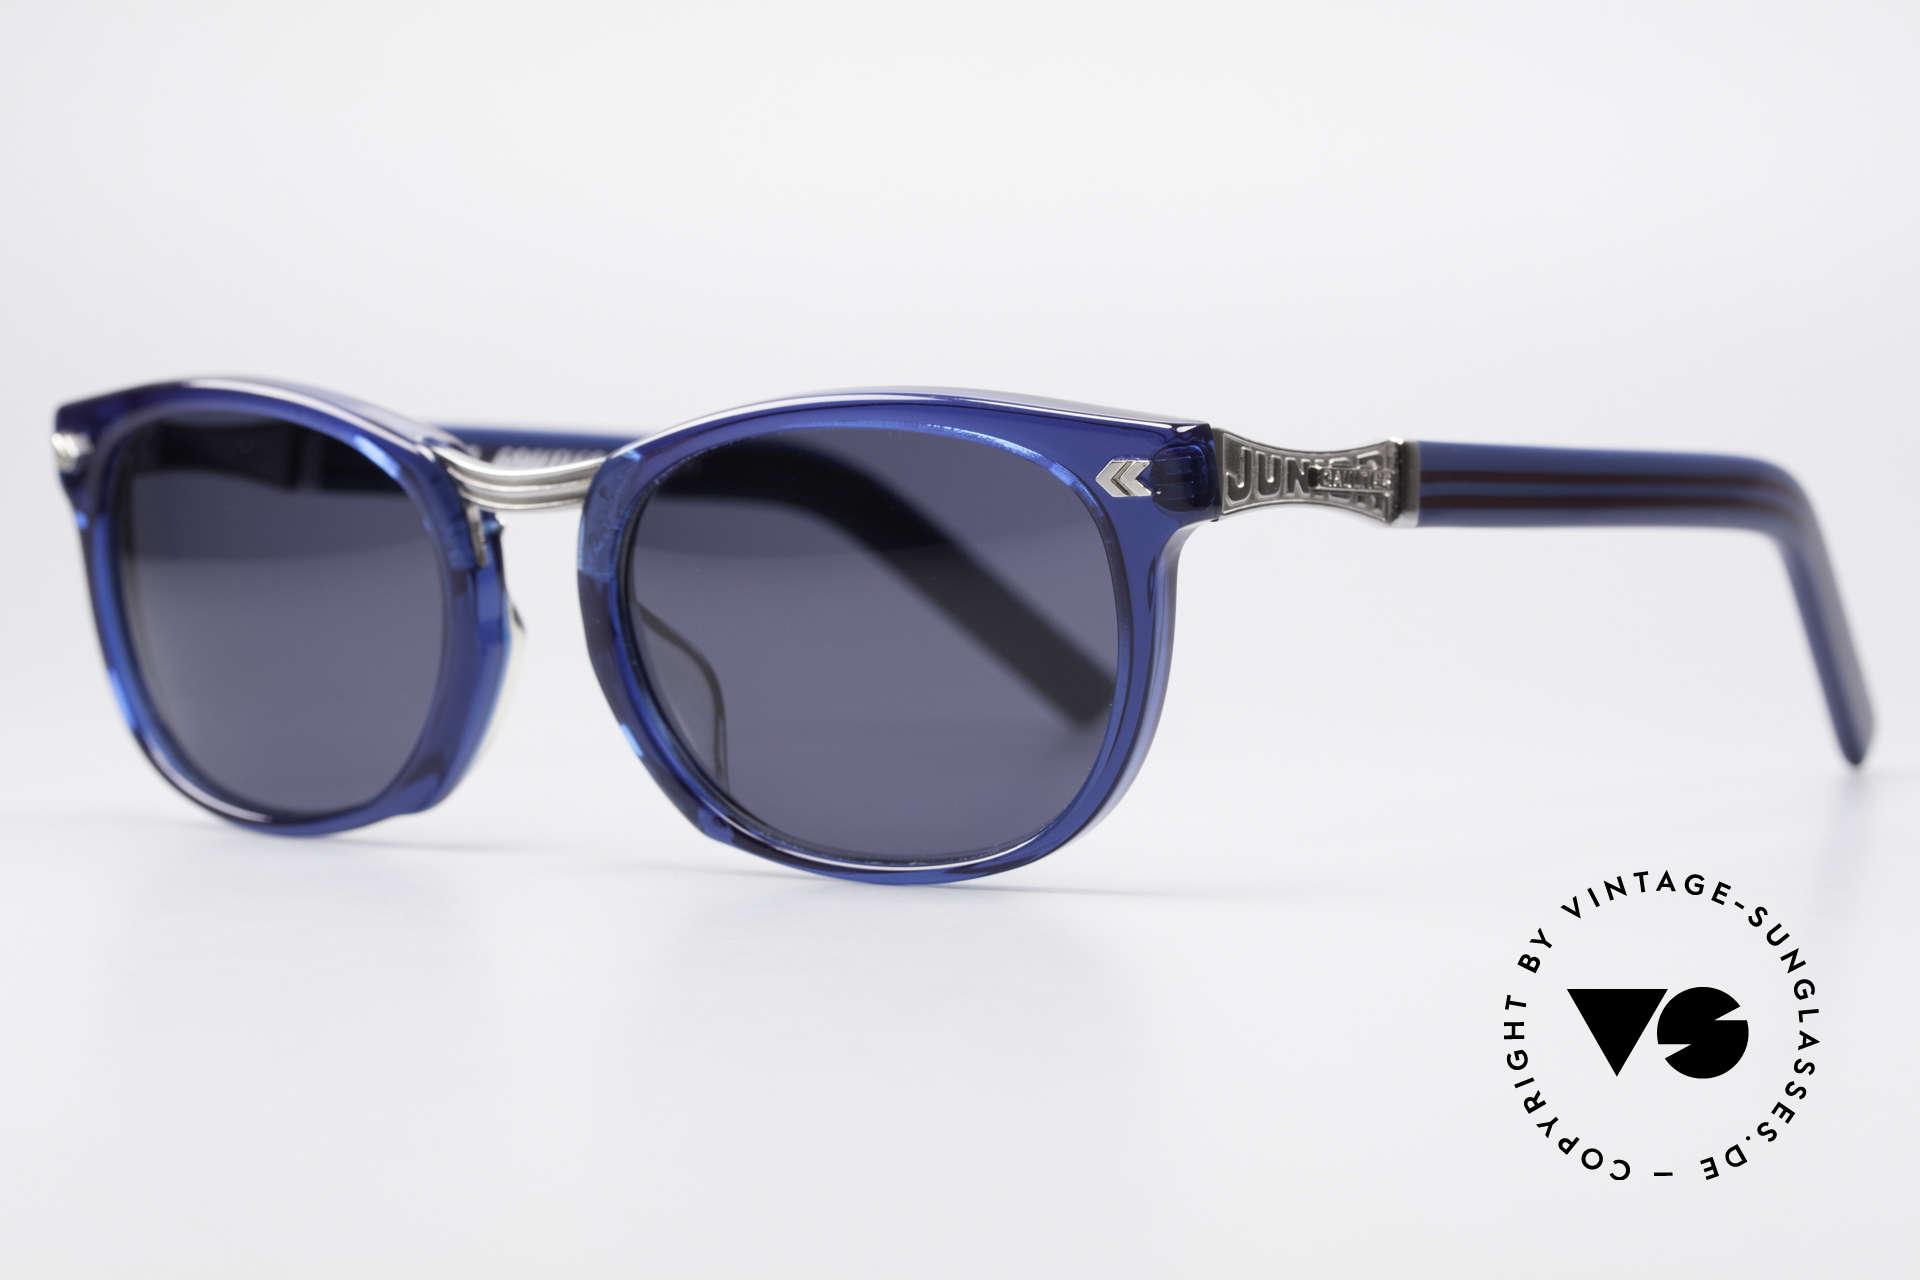 "Jean Paul Gaultier 58-1271 Junior Gaultier Sunglasses, striking design = typically ""JUNIOR GAULTIER"" series, Made for Men and Women"